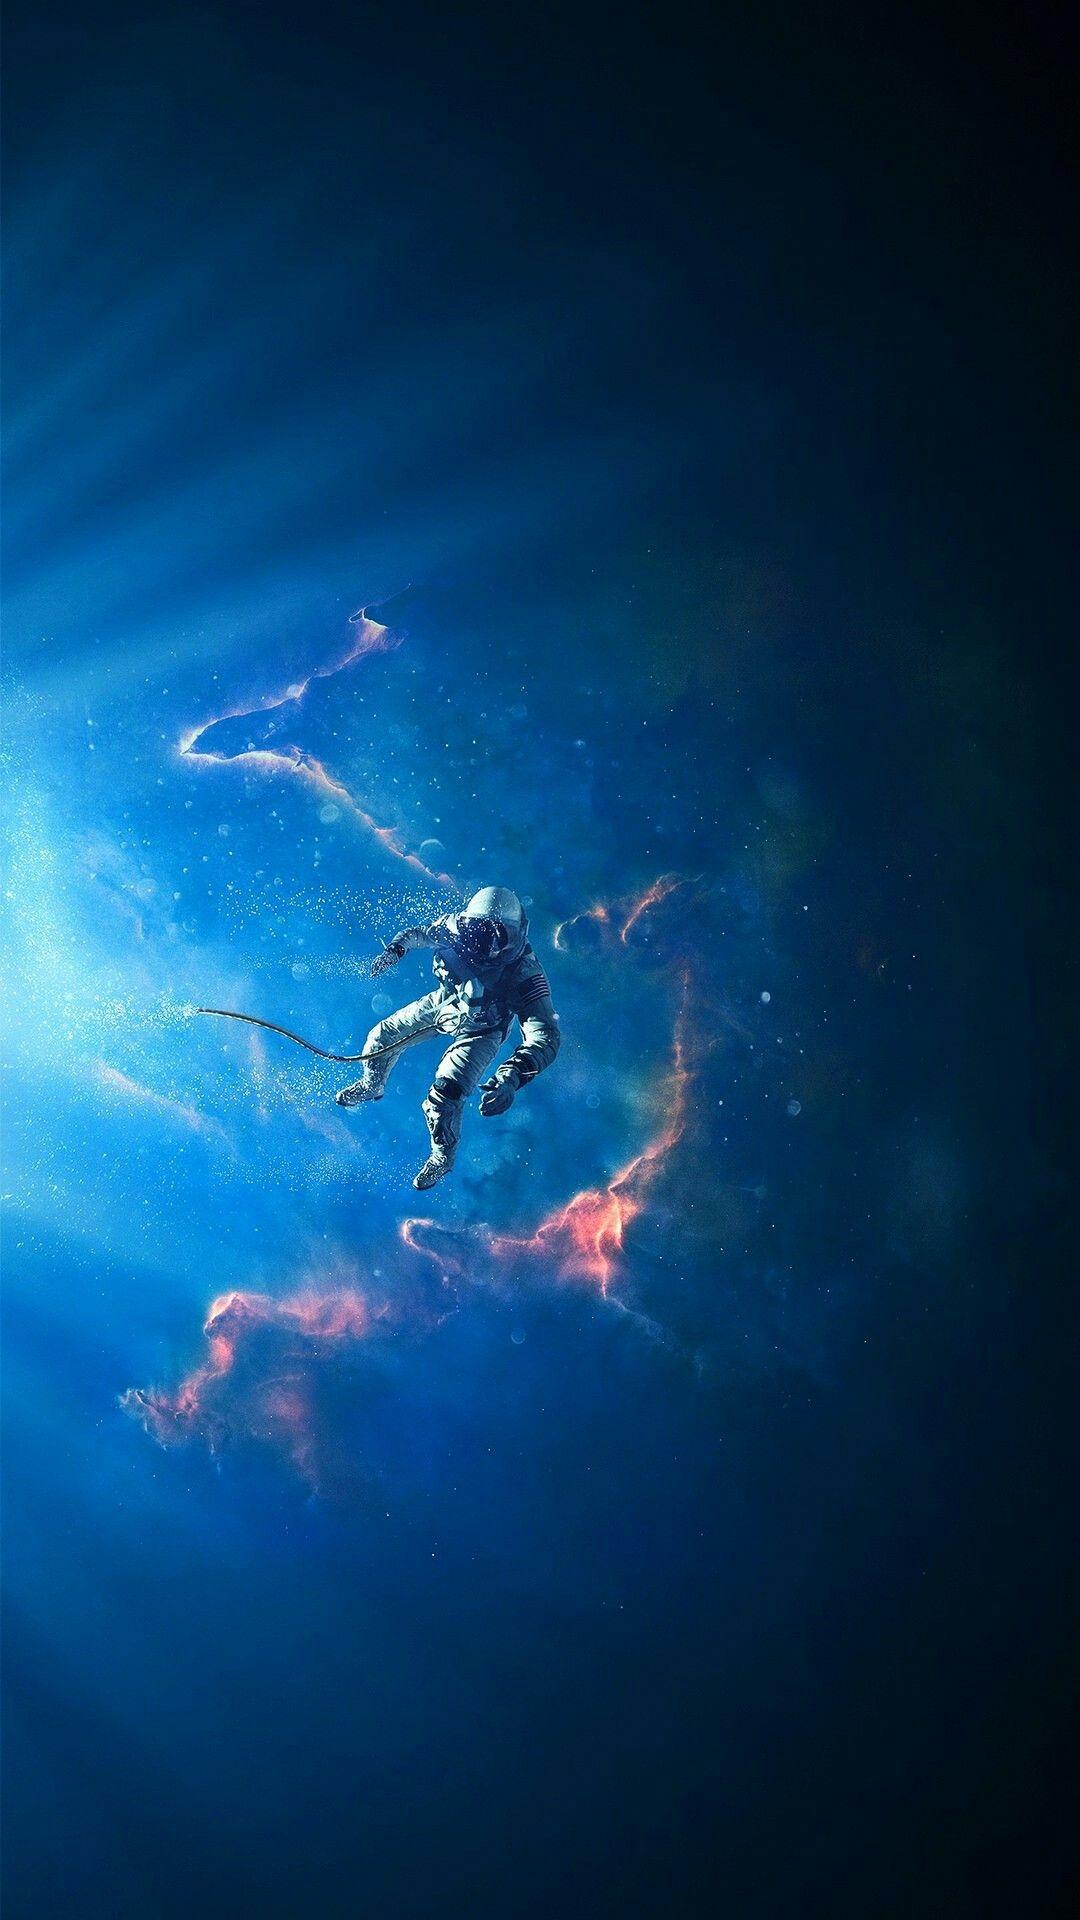 Deep space journeys Space artwork, Astronaut wallpaper